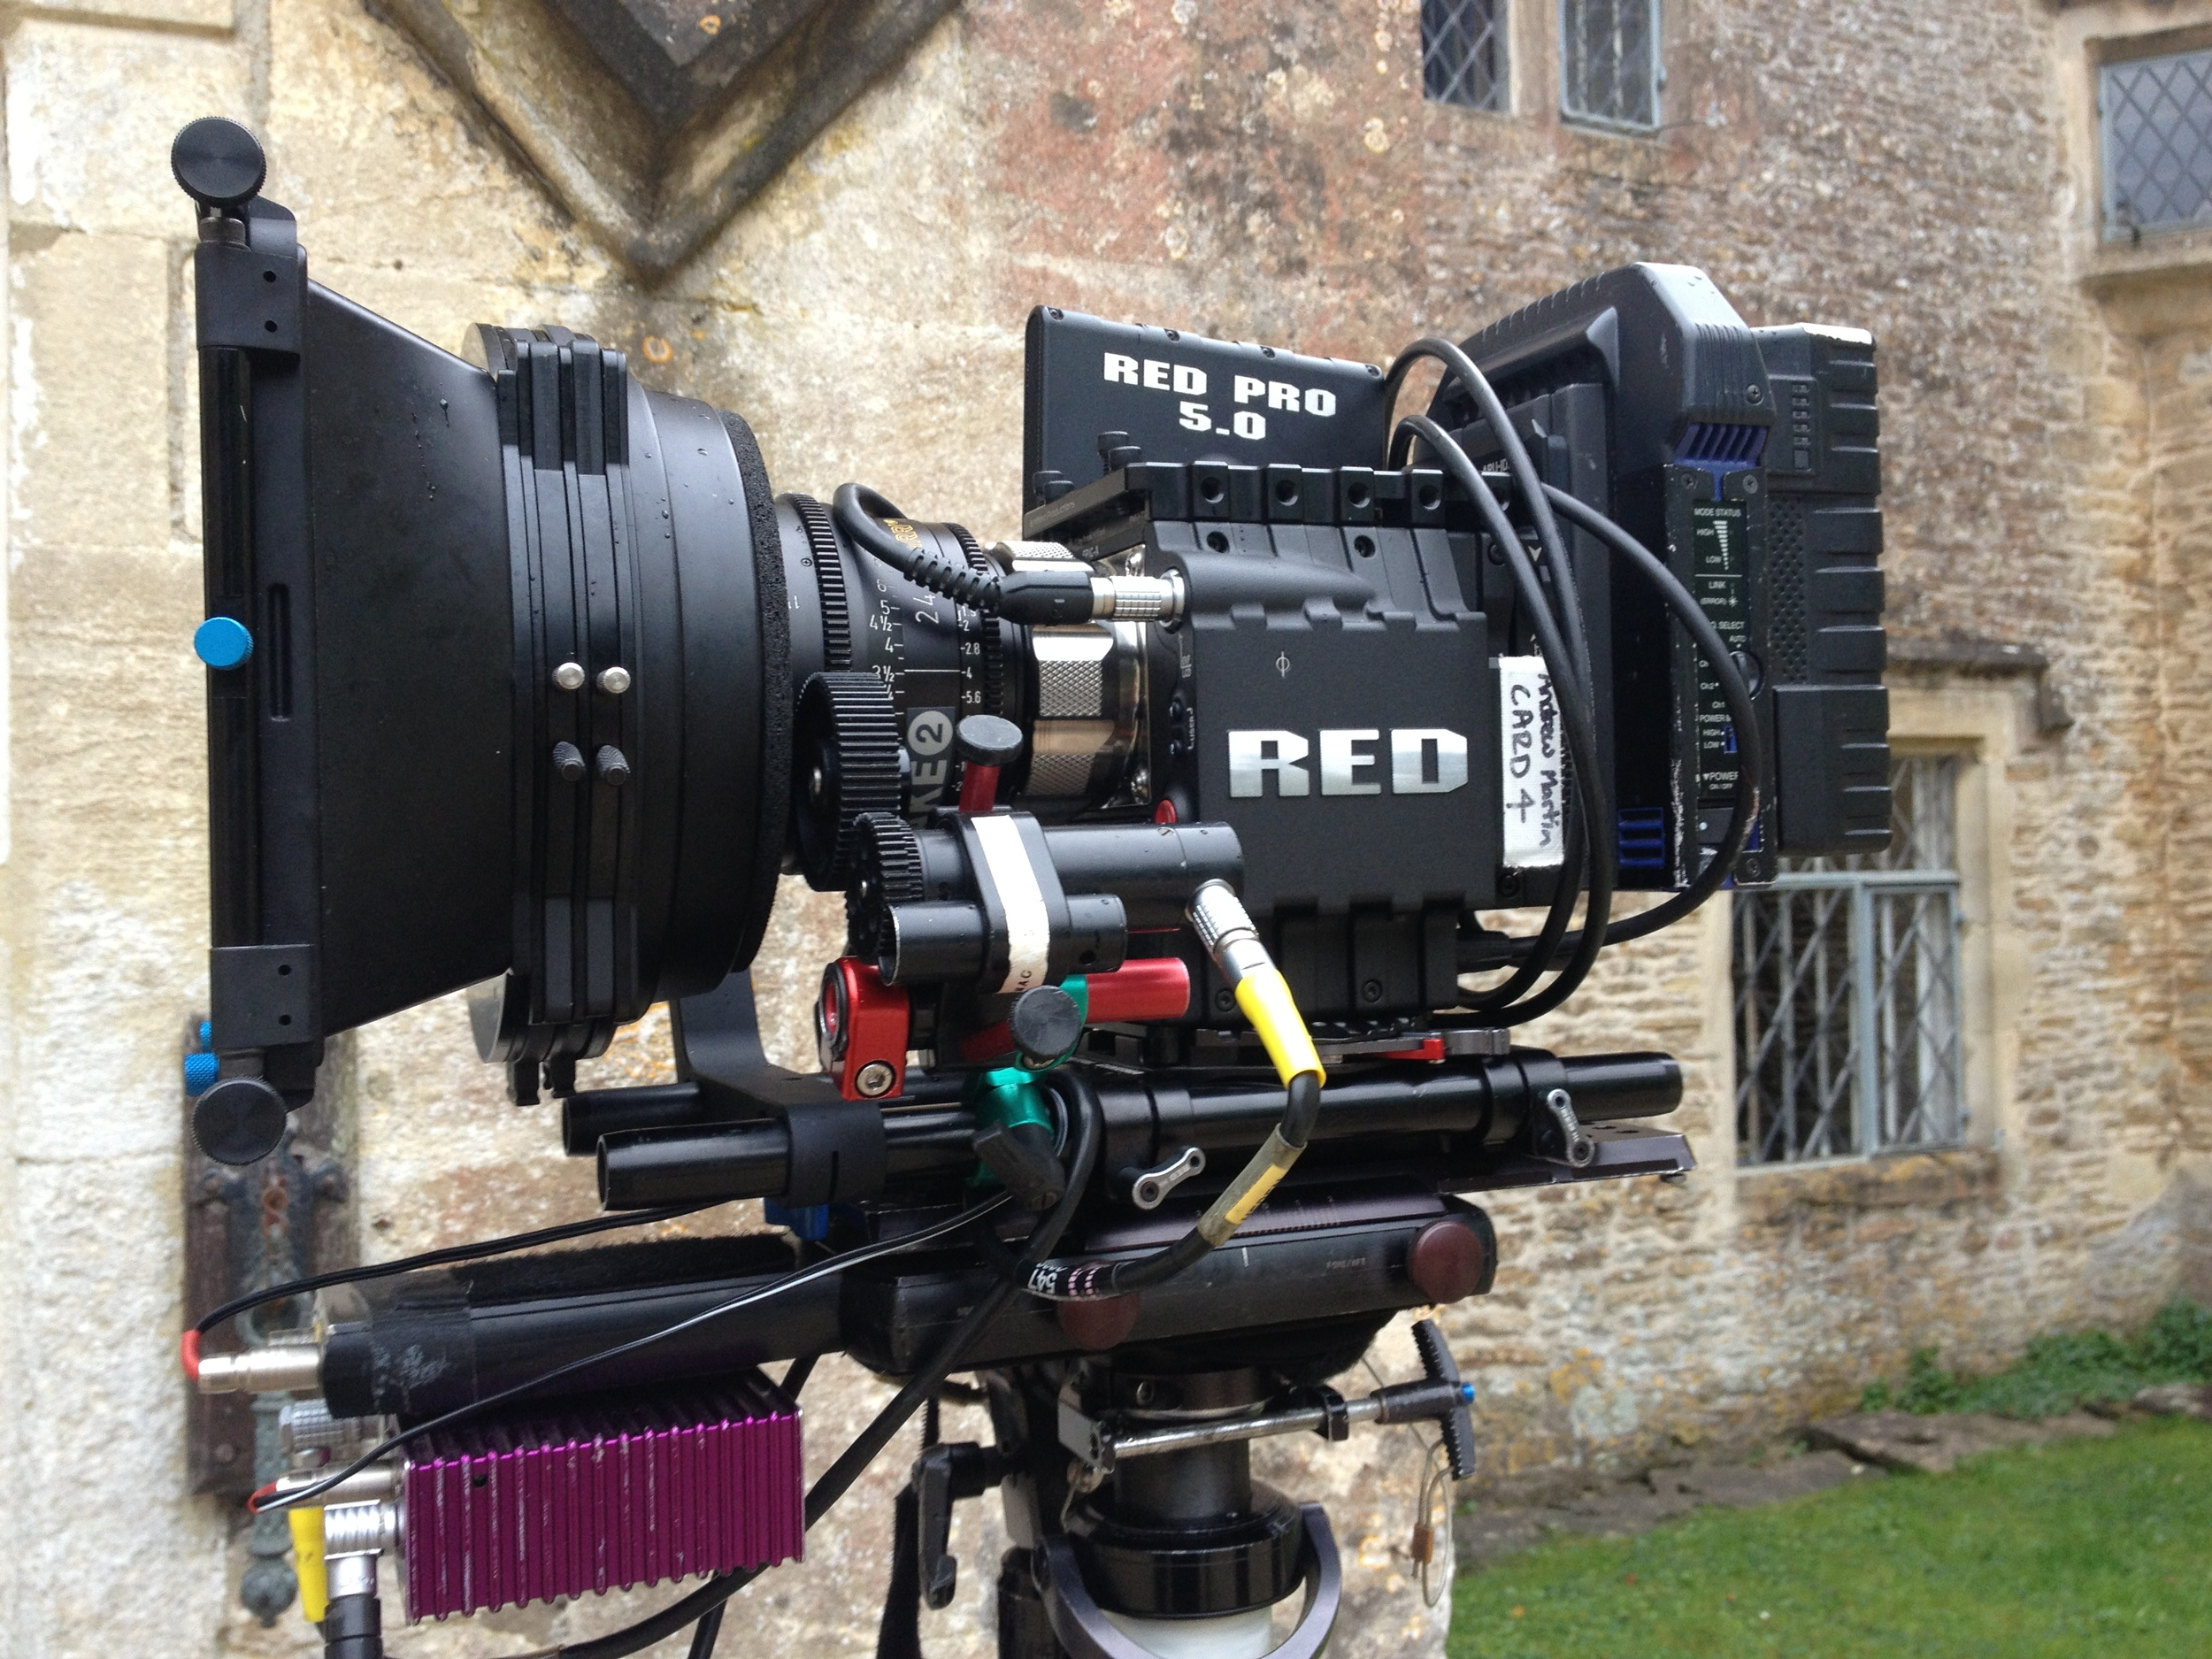 Richard Cornelius - Director of Photography